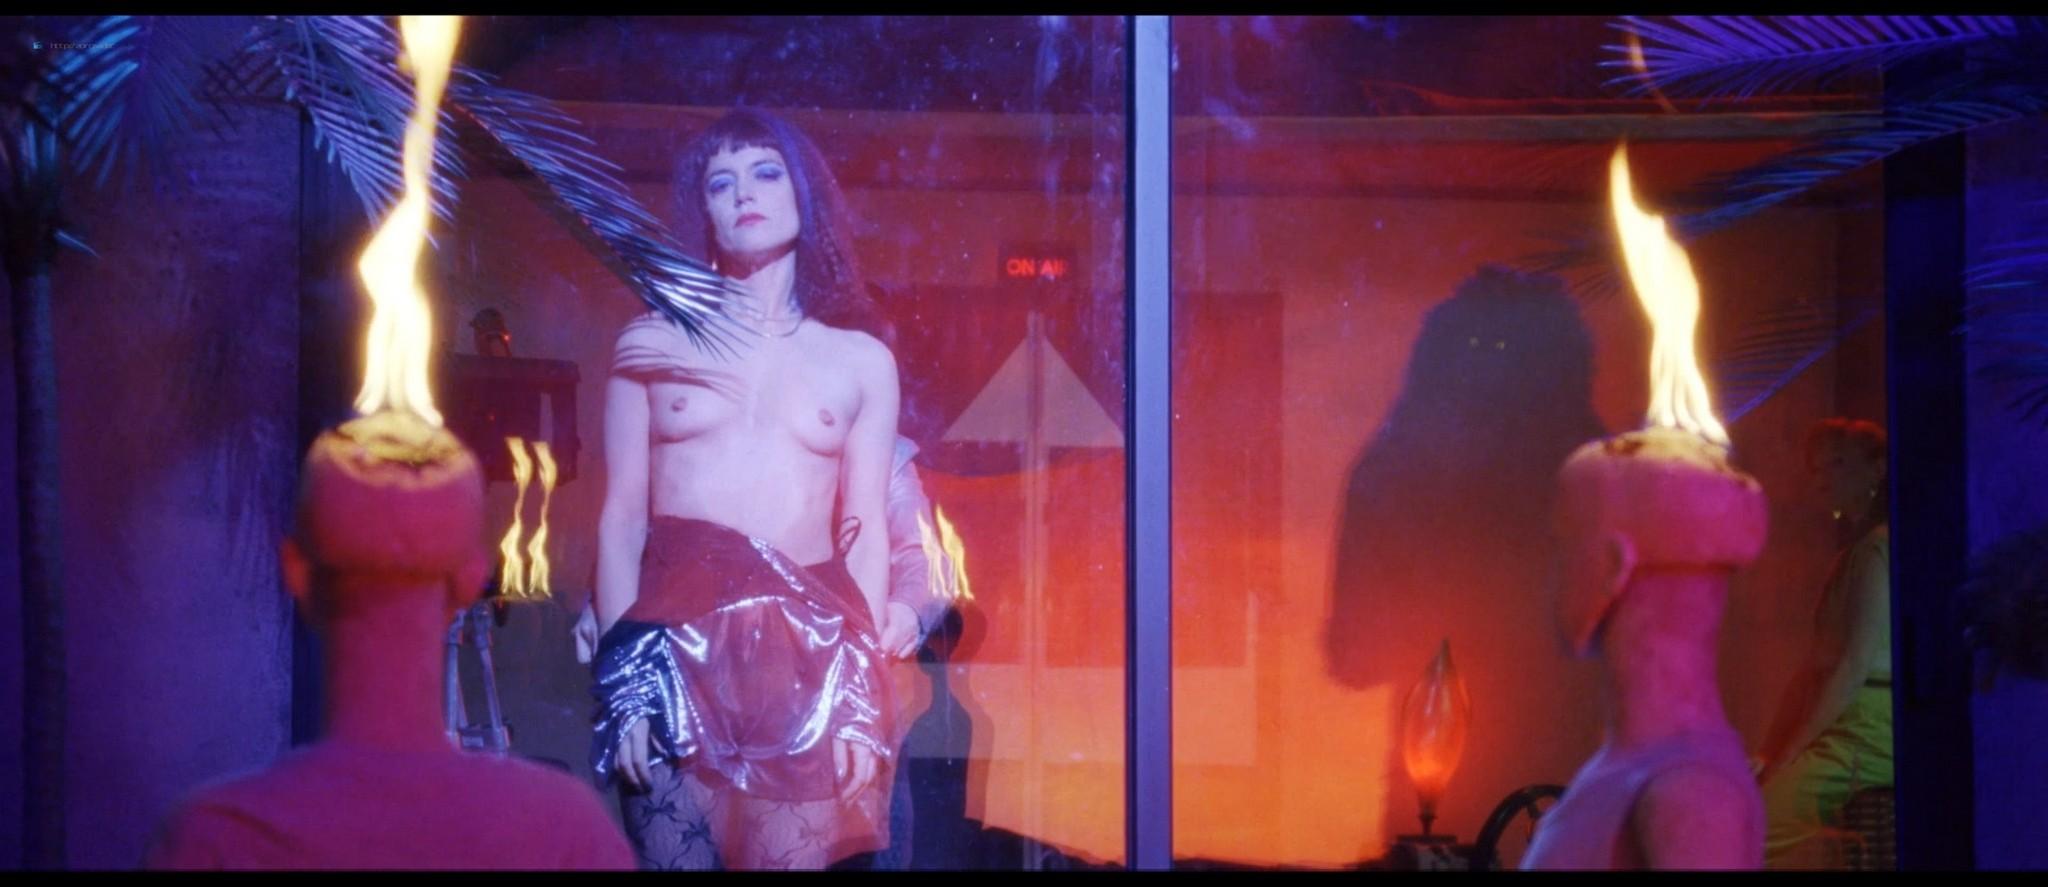 Vimala Pons nude Pauline Jacquard, Lola Créton asnd other nude too - Ultra pulpe (2018) HD 1080p Web (13)